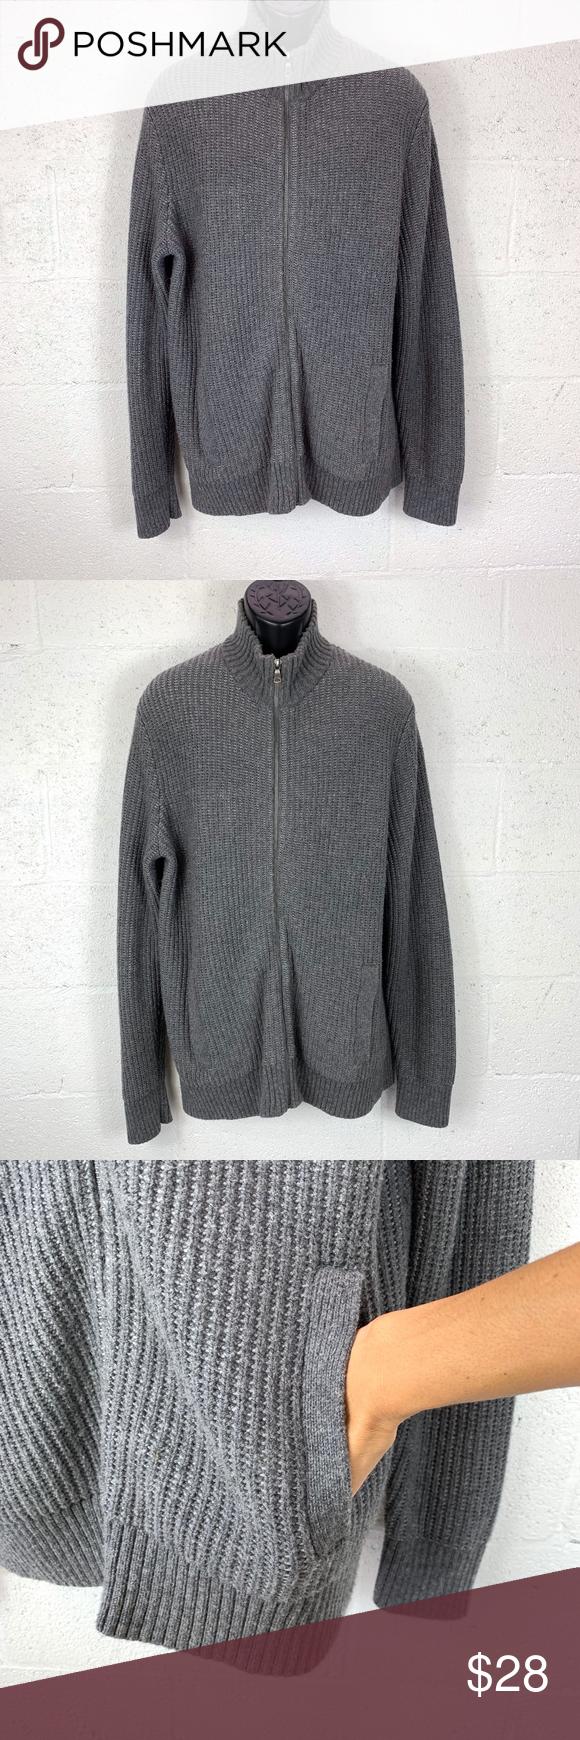 Banana Republic Factory Sz XL Knit Zip Up Sweater Banana